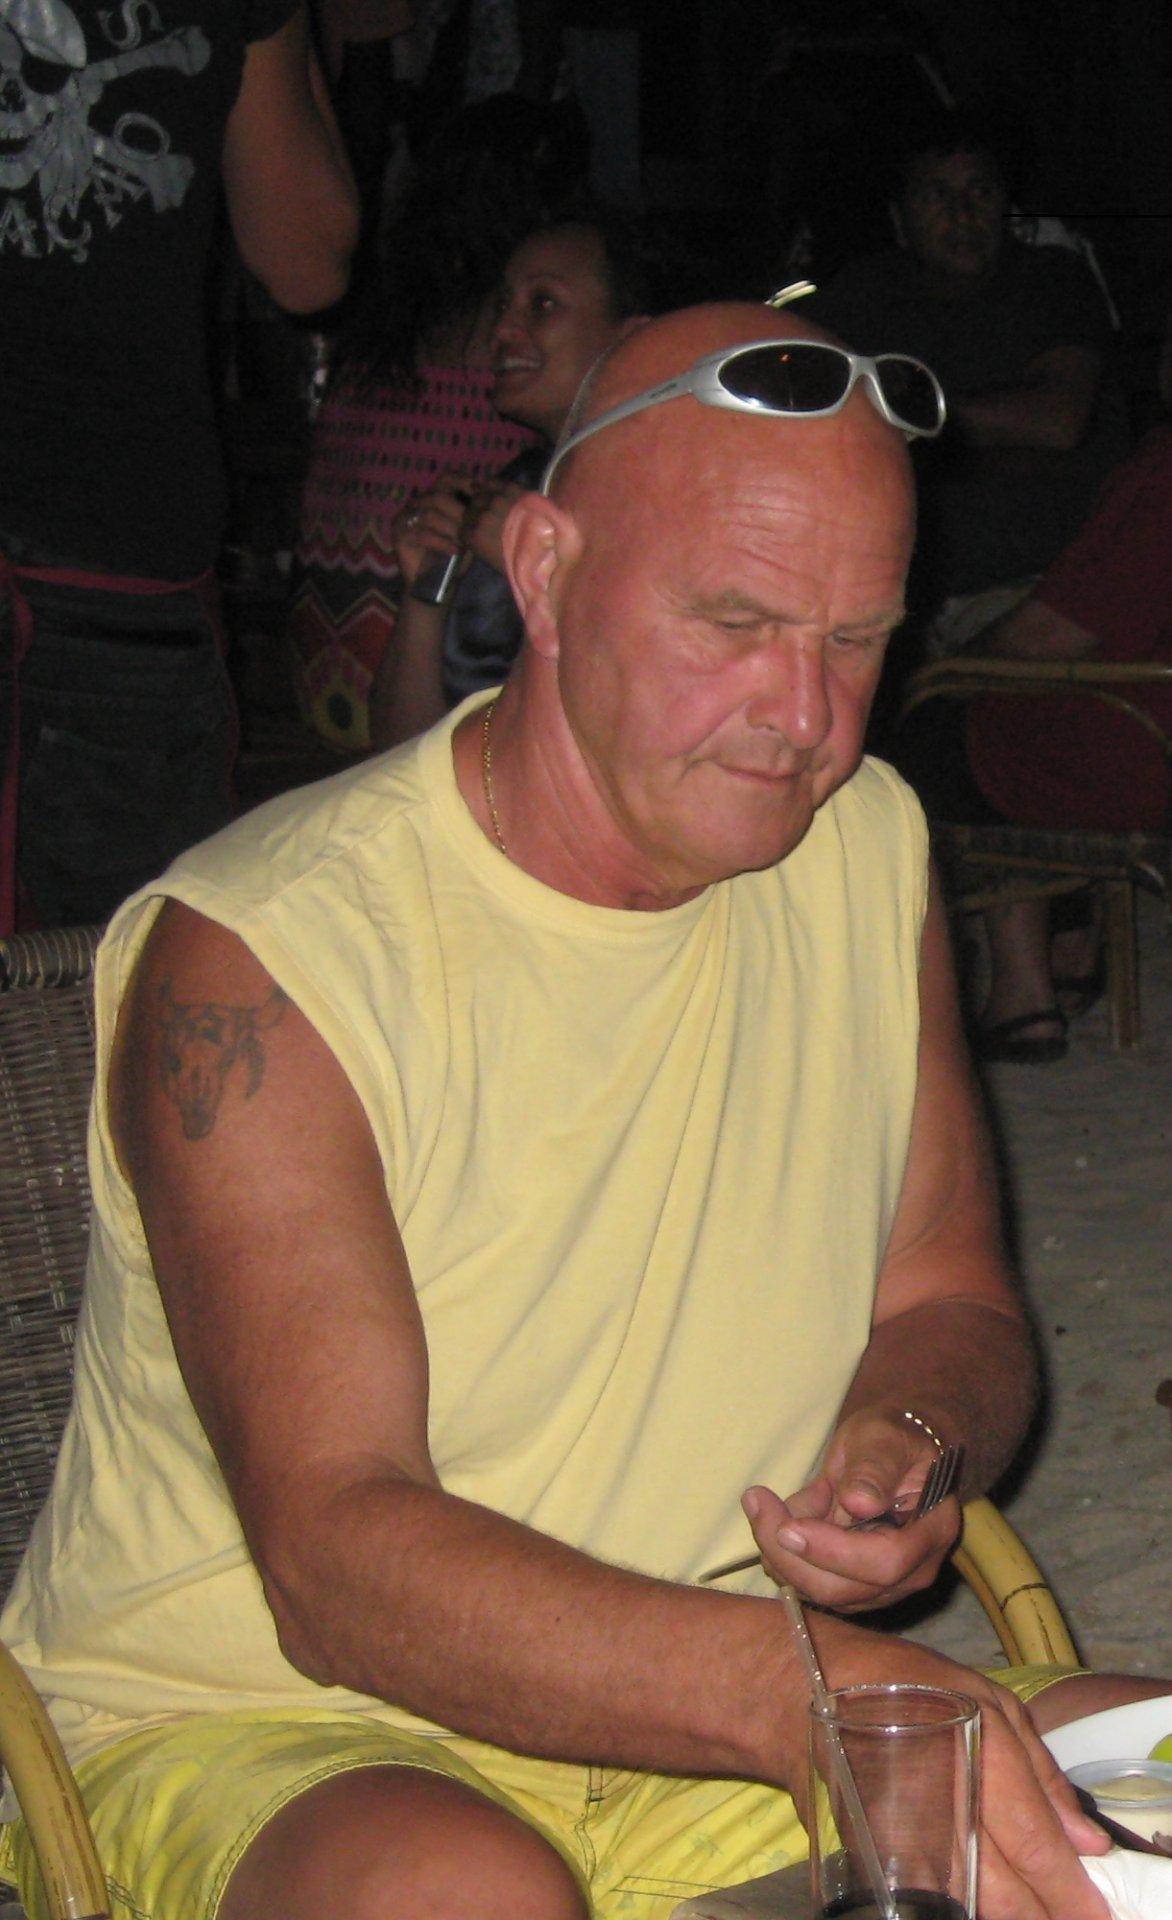 Rick1956 uit Noord-Brabant,Nederland